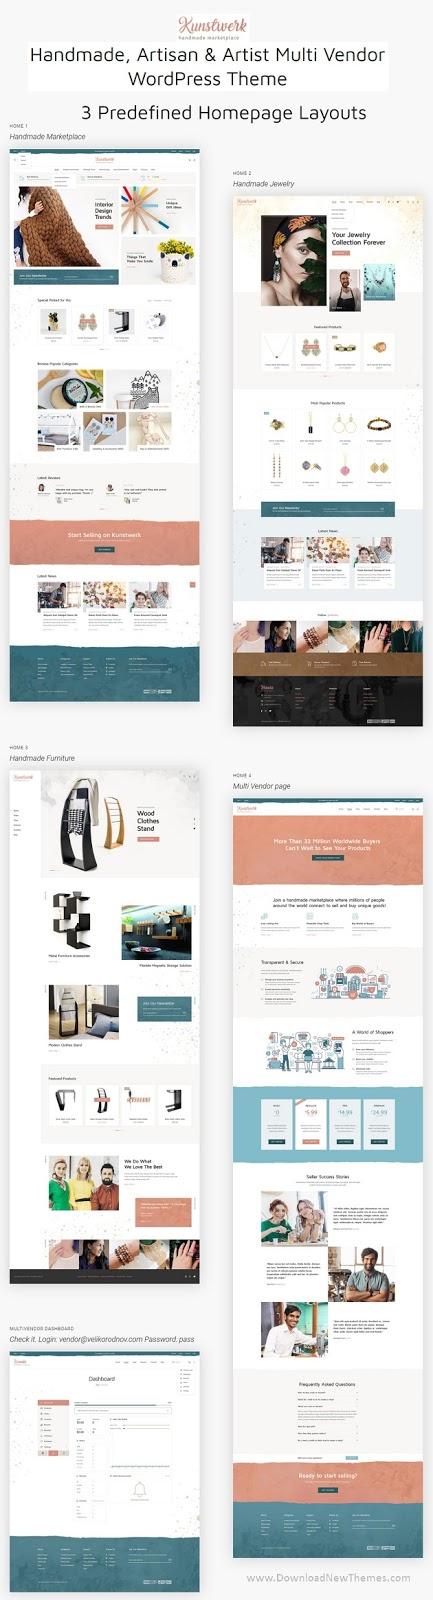 Handycraft Marketplace Website Theme